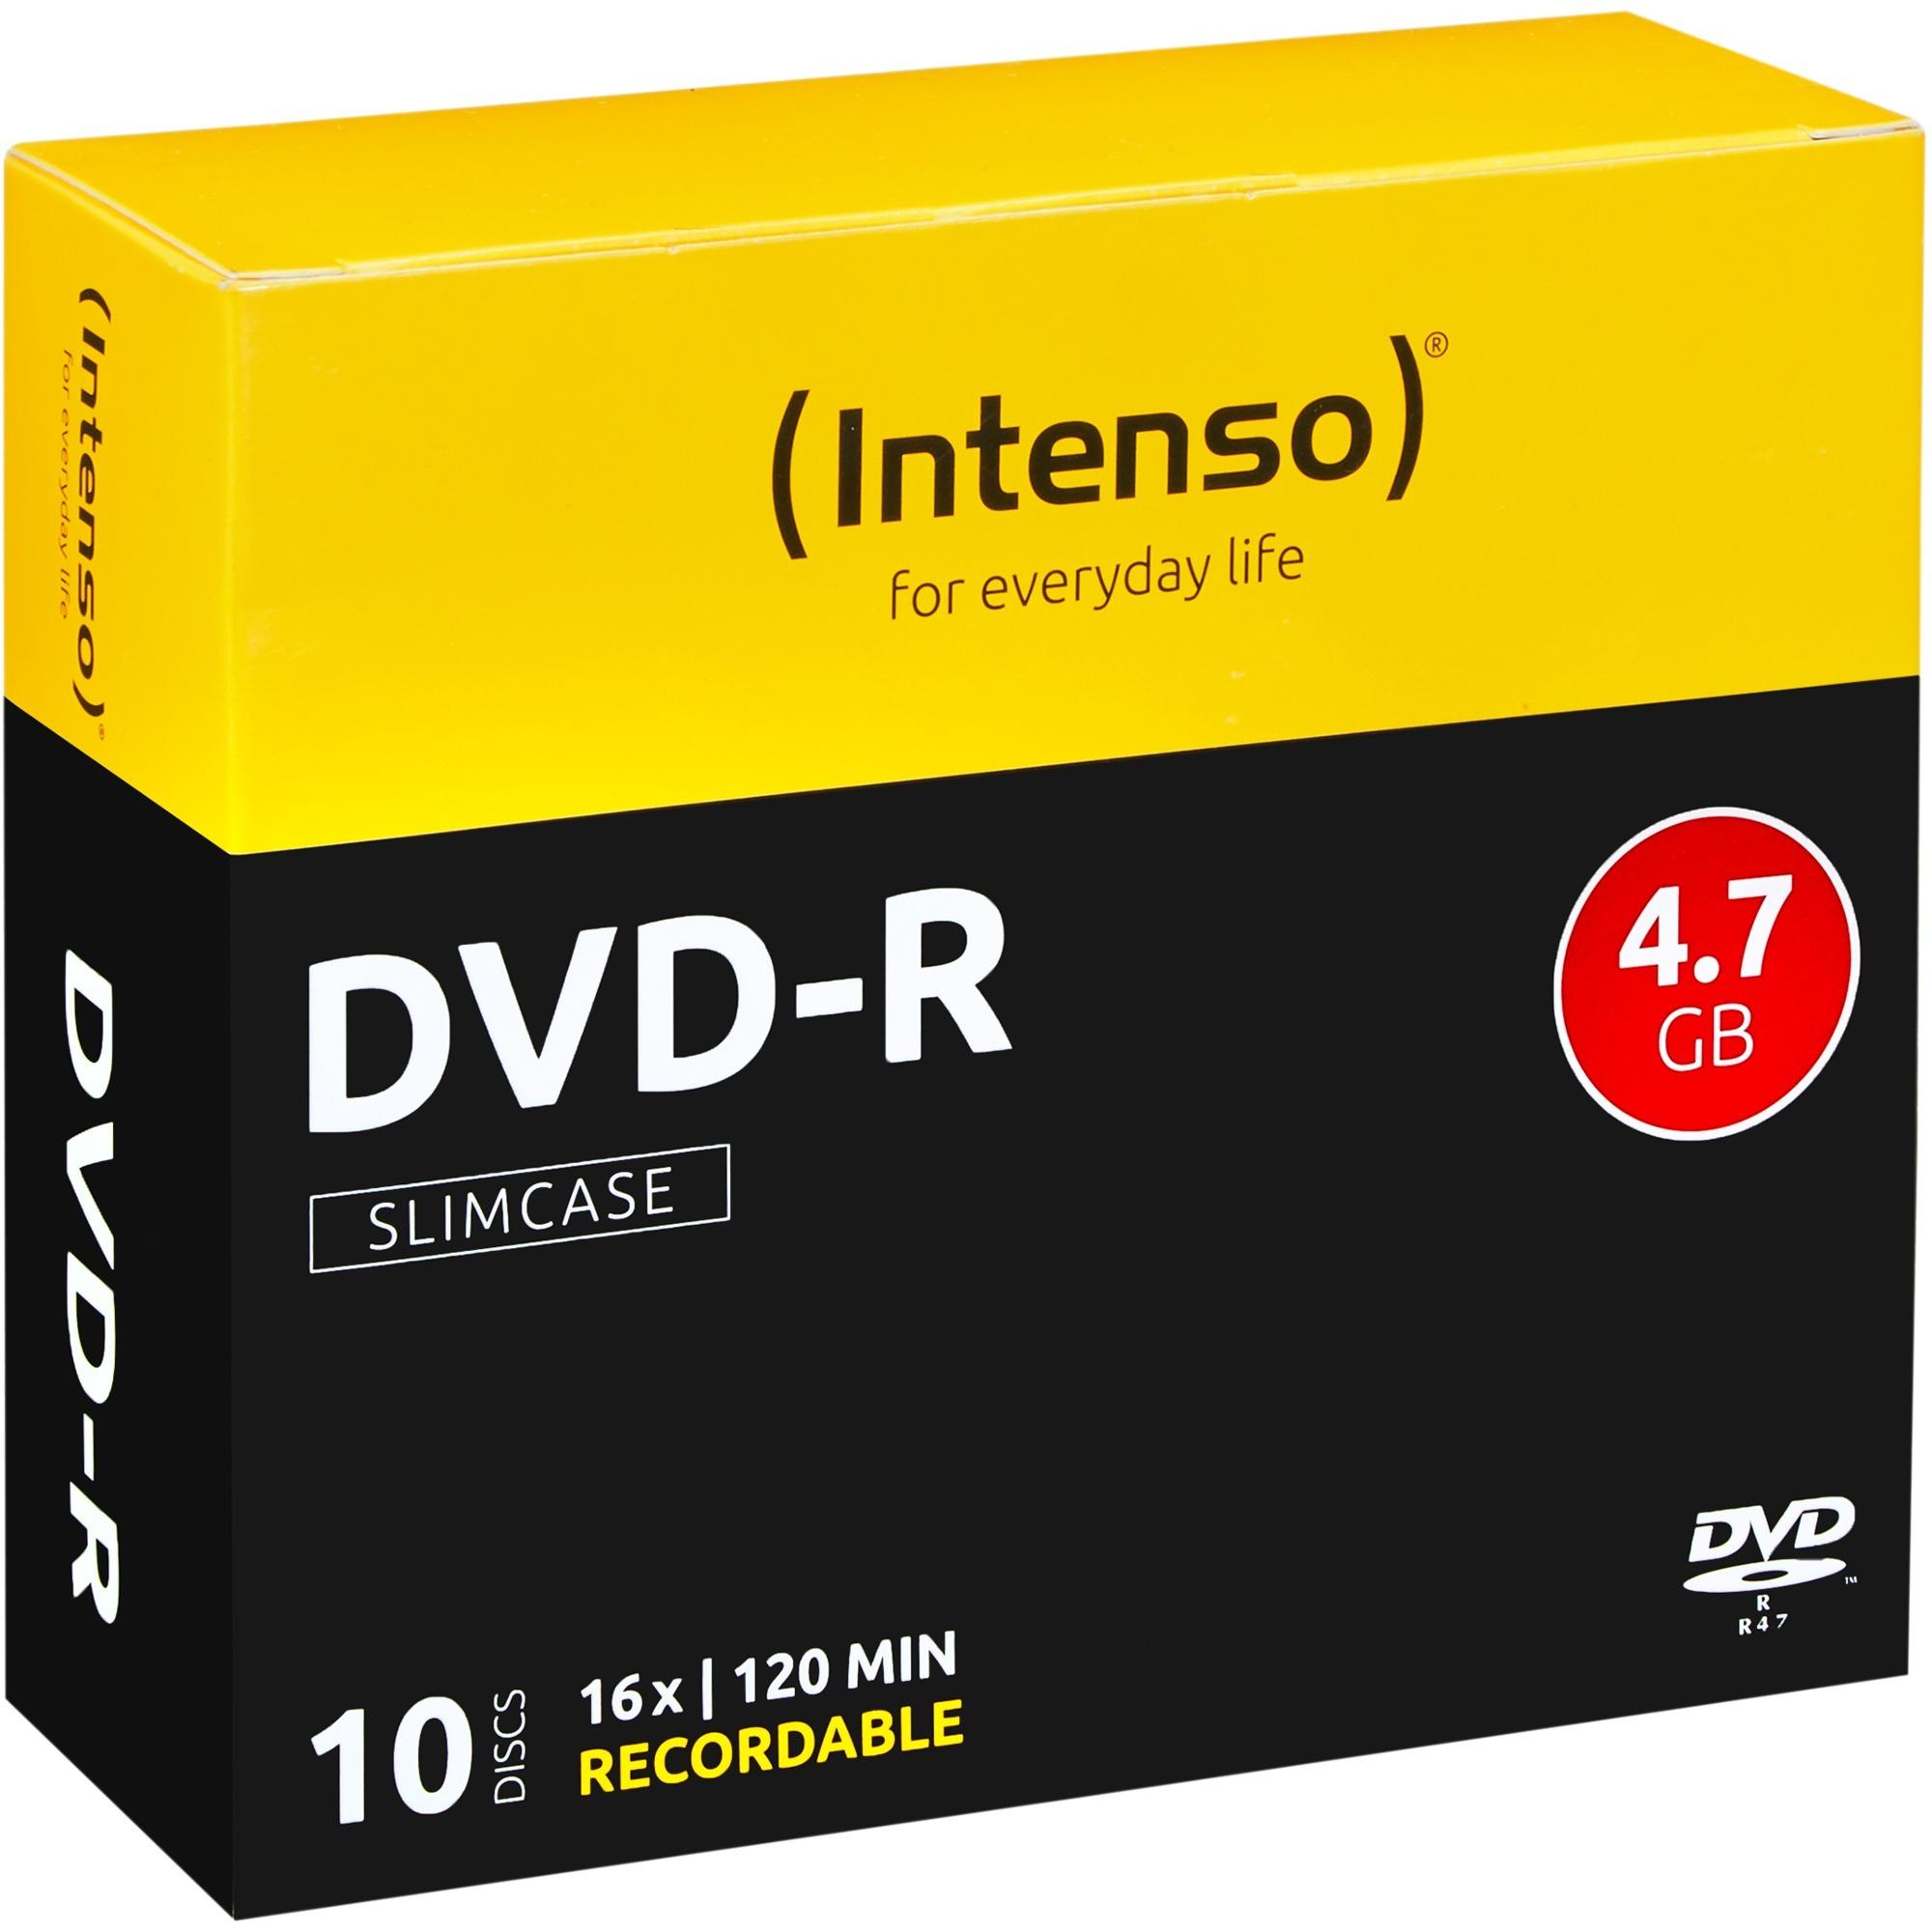 DVD-R 4.7GB, 16x 4.7Go DVD-R 10pièce(s), Support vierge DVD